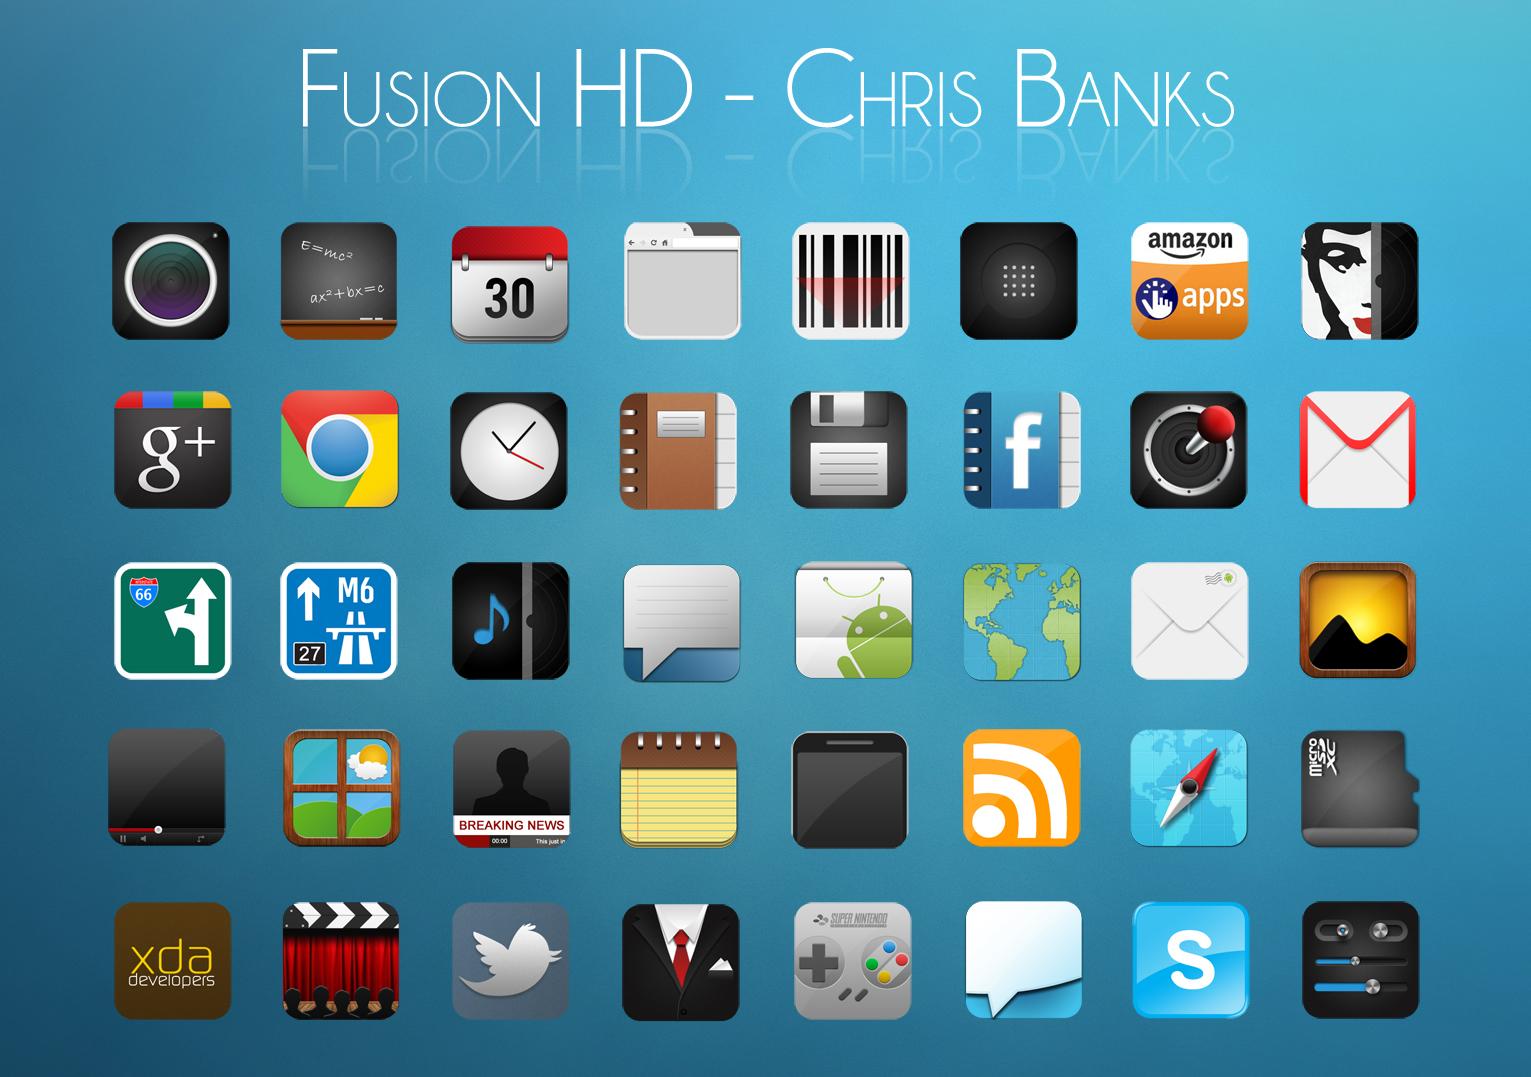 Fusion HD